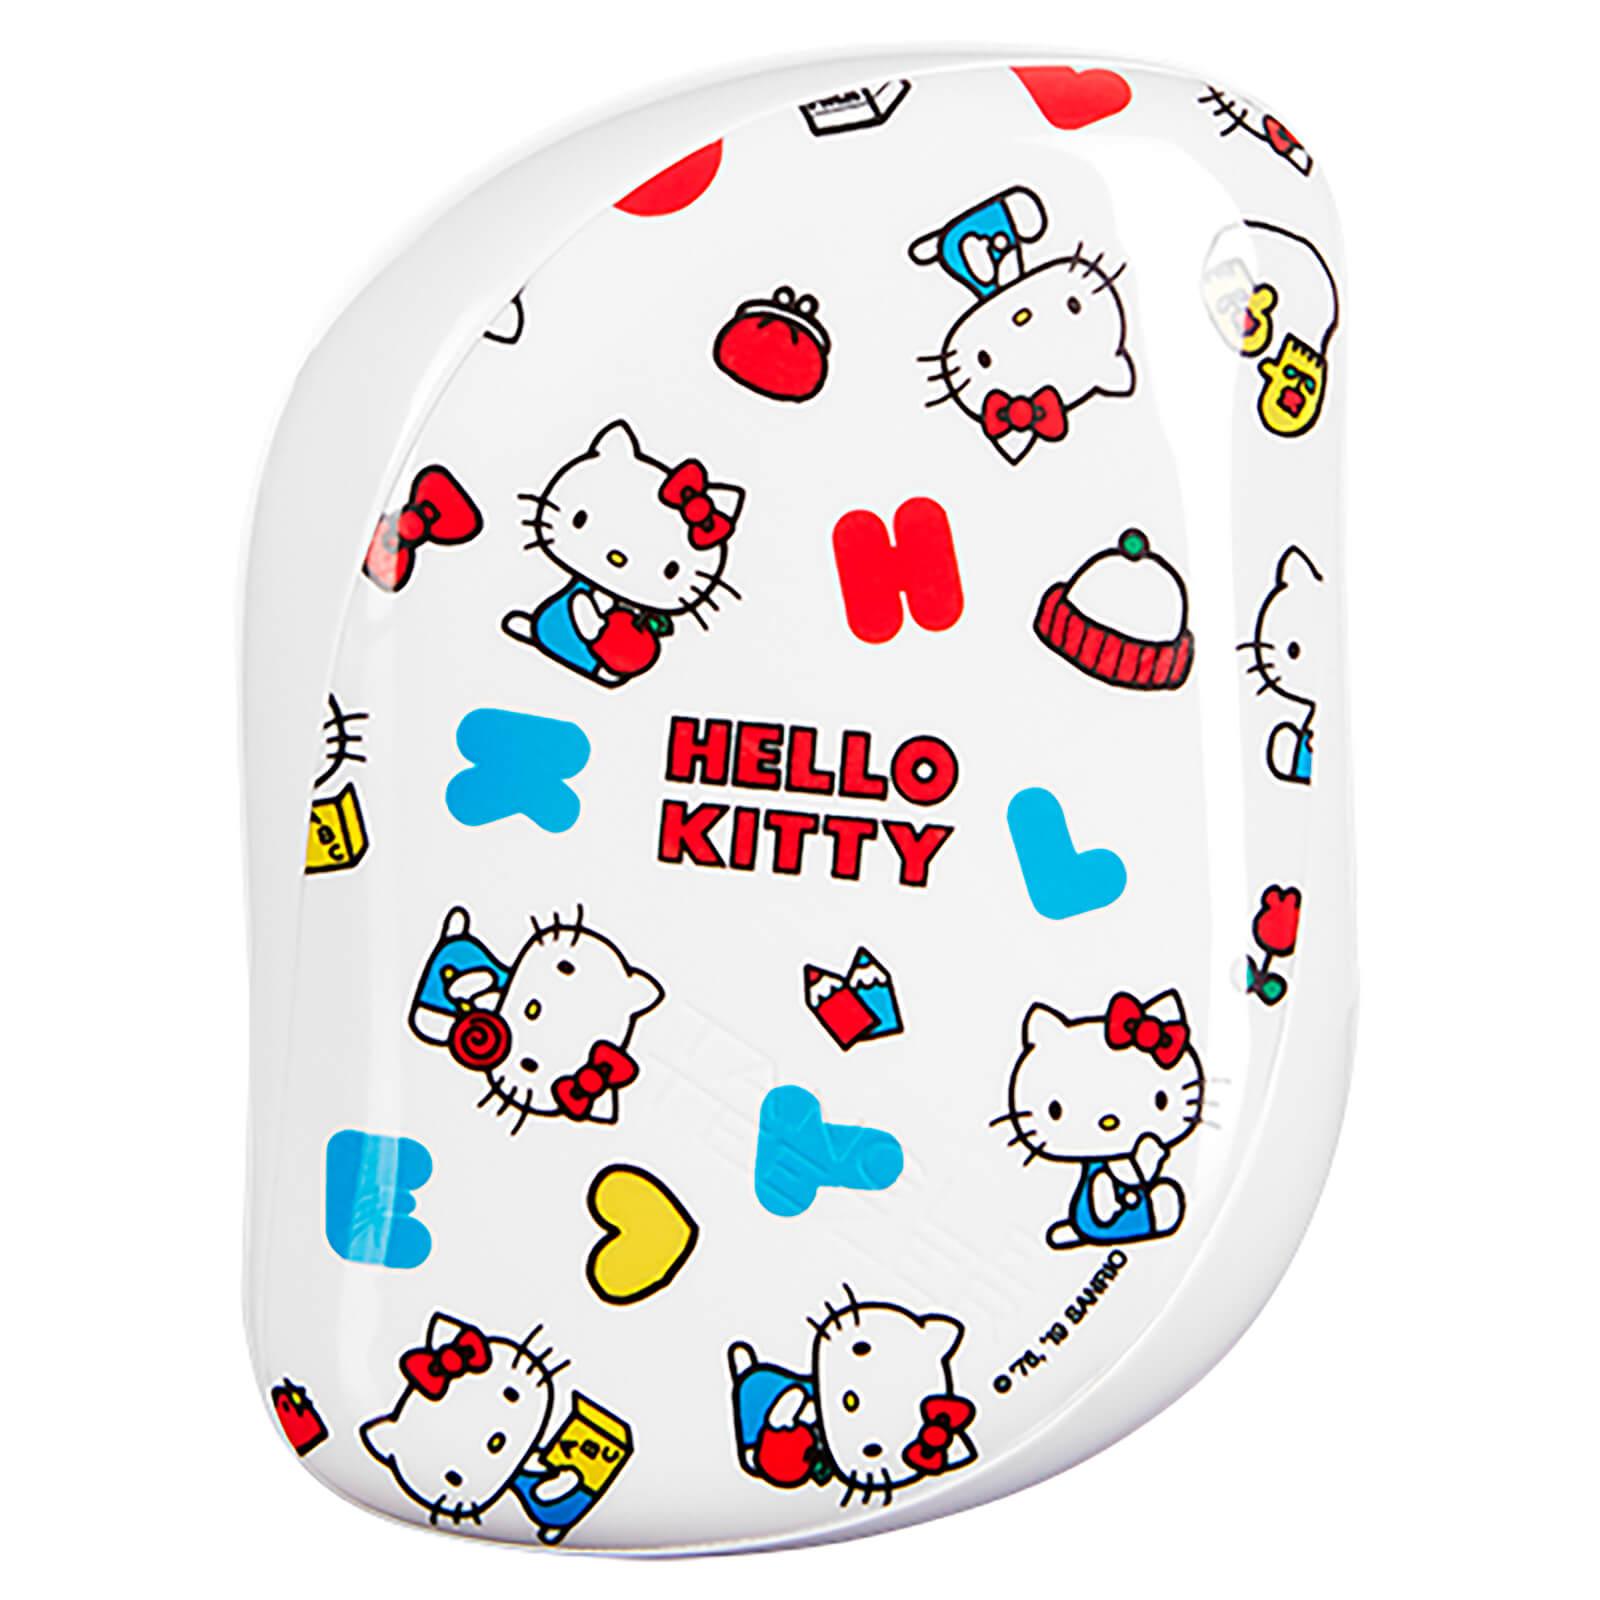 Tangle Teezer x Hello Kitty Compact Styler - Happy Life